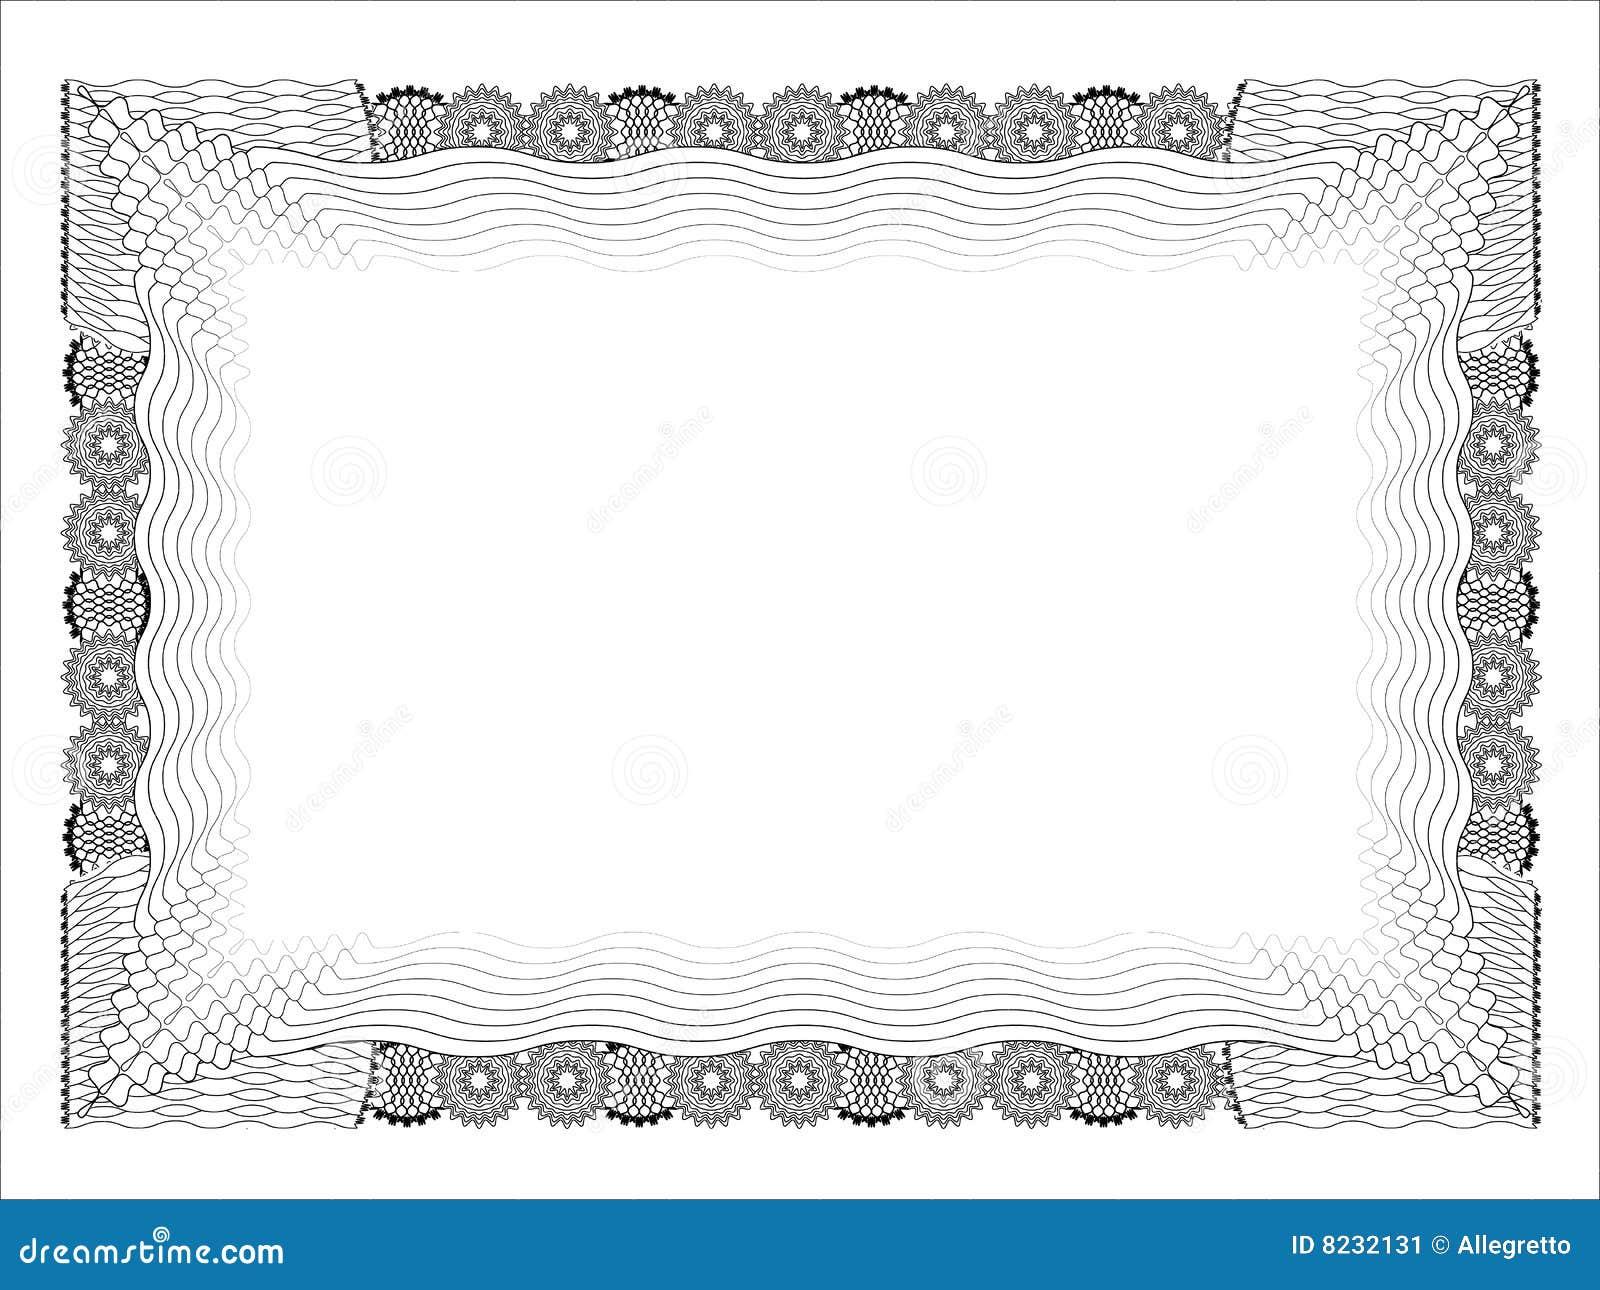 Stock Image: Blank diploma template. Image: 8232131